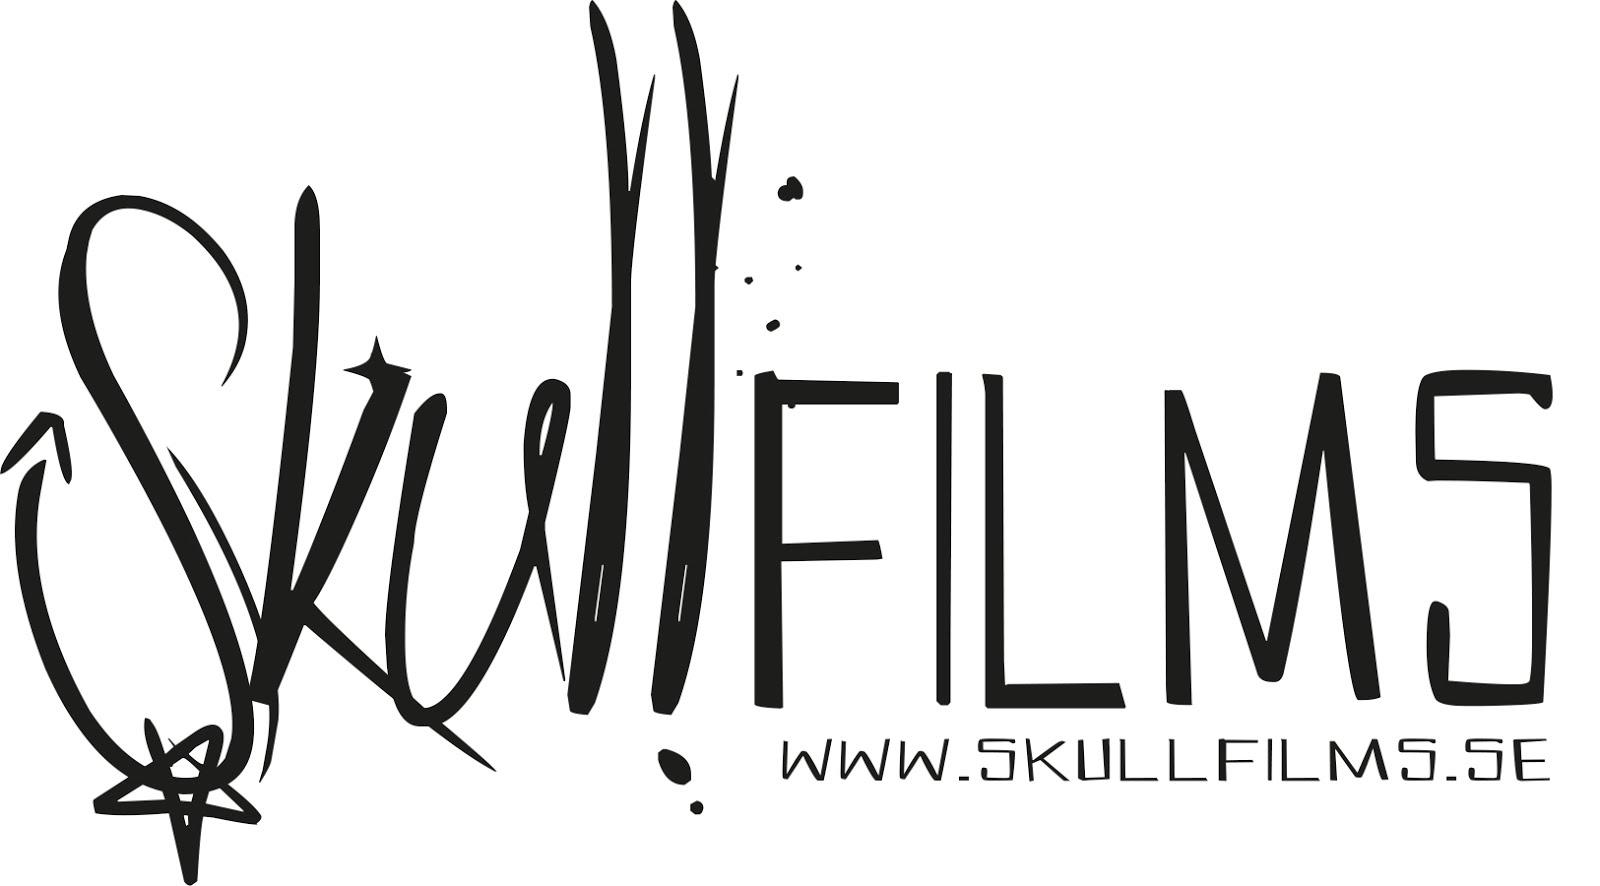 Contact SkullFilms